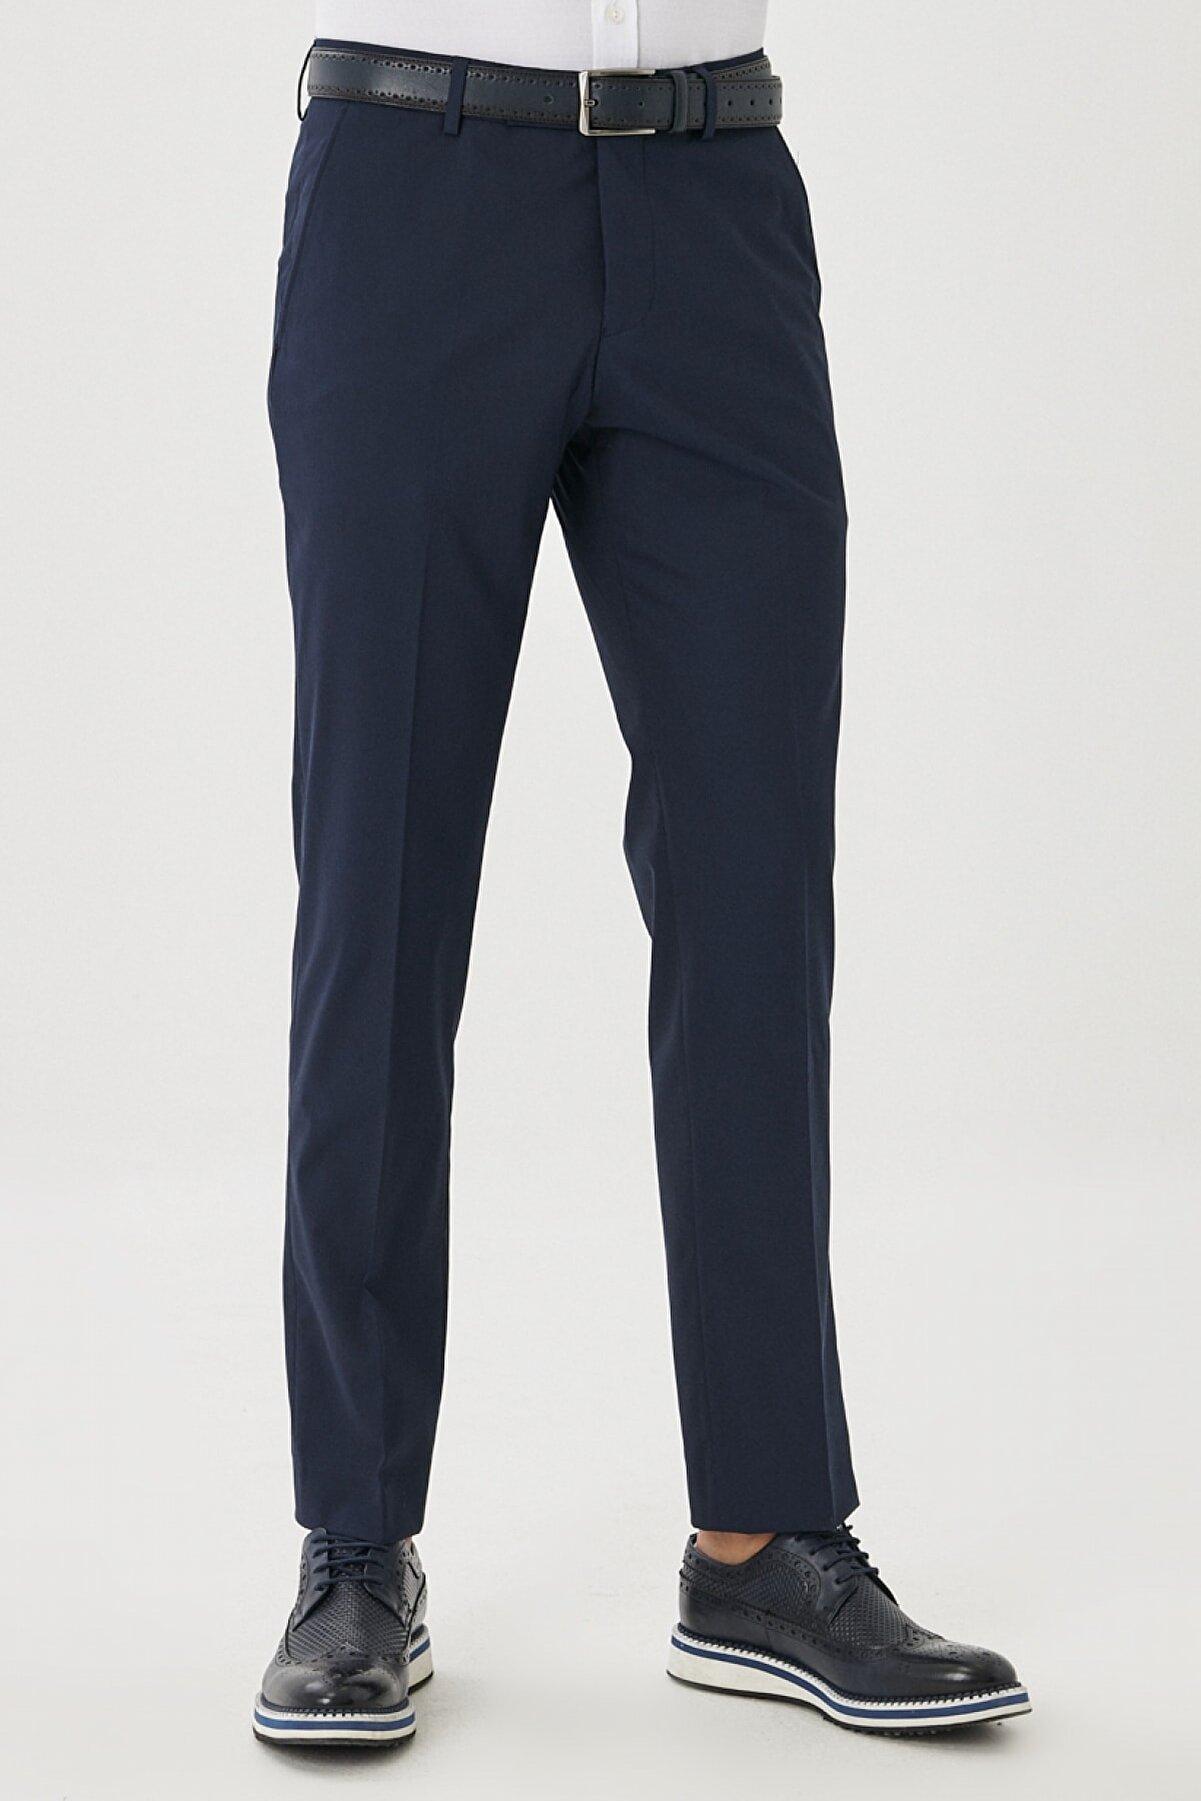 Altınyıldız Classics Erkek Lacivert Regular Fit Klasik Pantolon